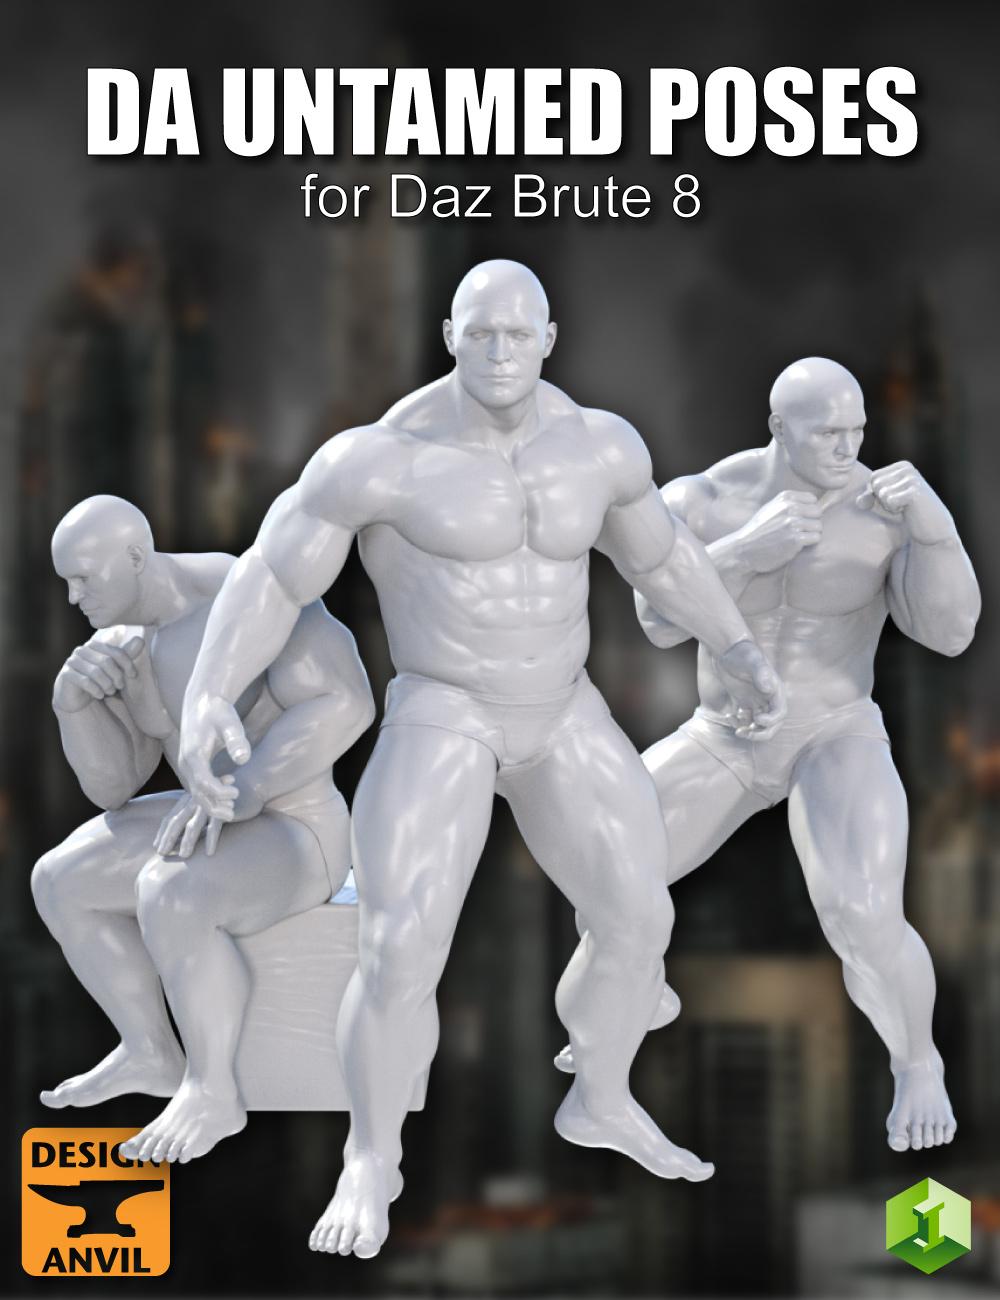 DA Untamed Poses for The Brute 8 by: Design Anvil, 3D Models by Daz 3D